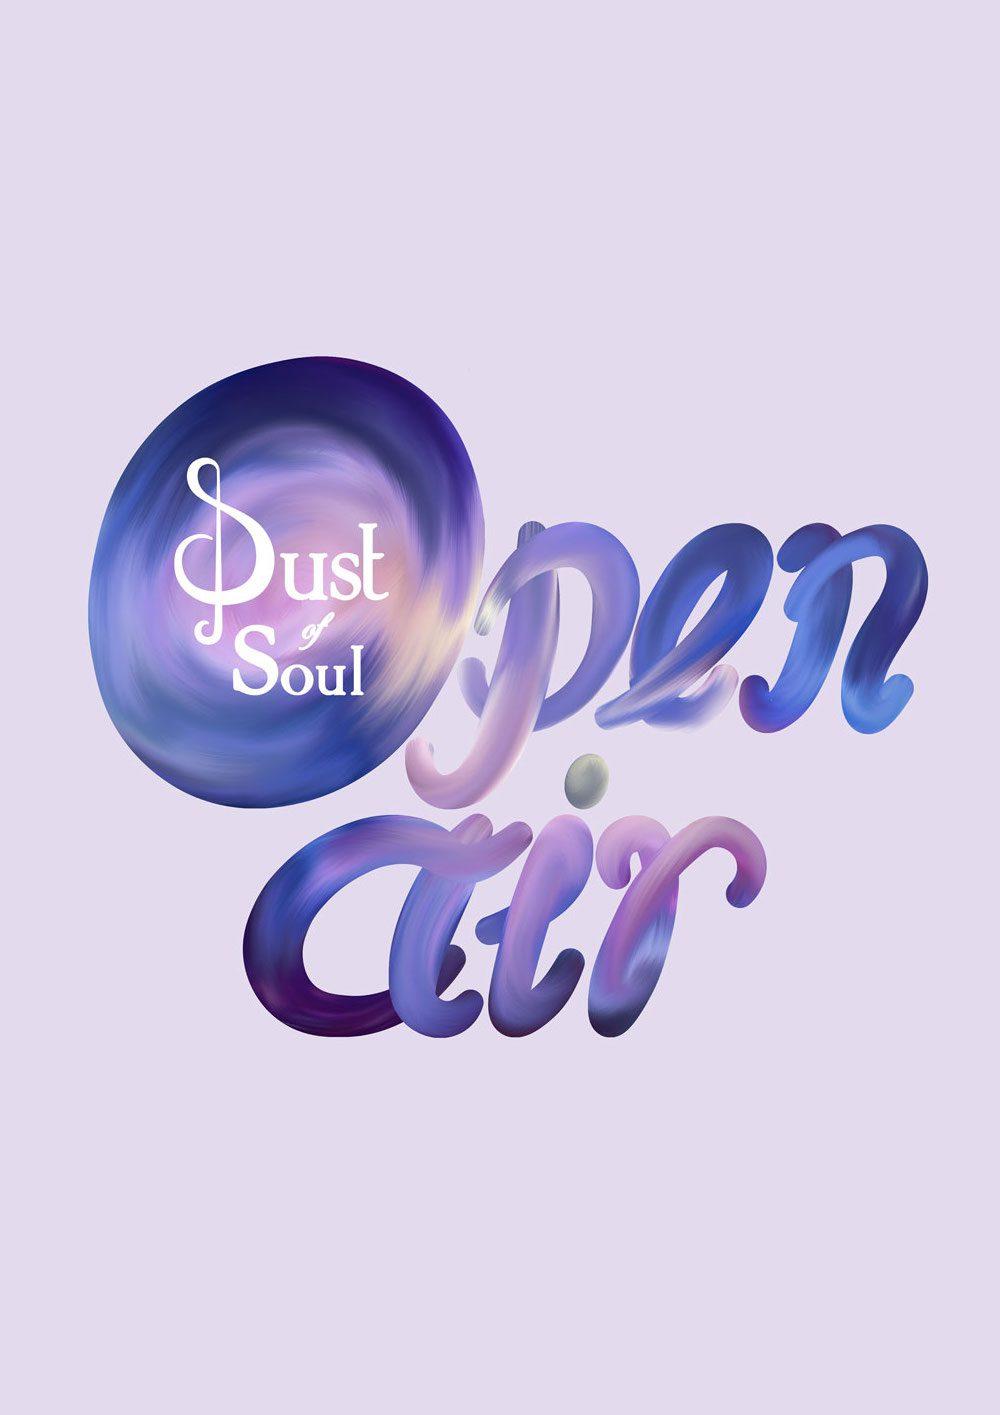 Dust of Soul Open Air 2019